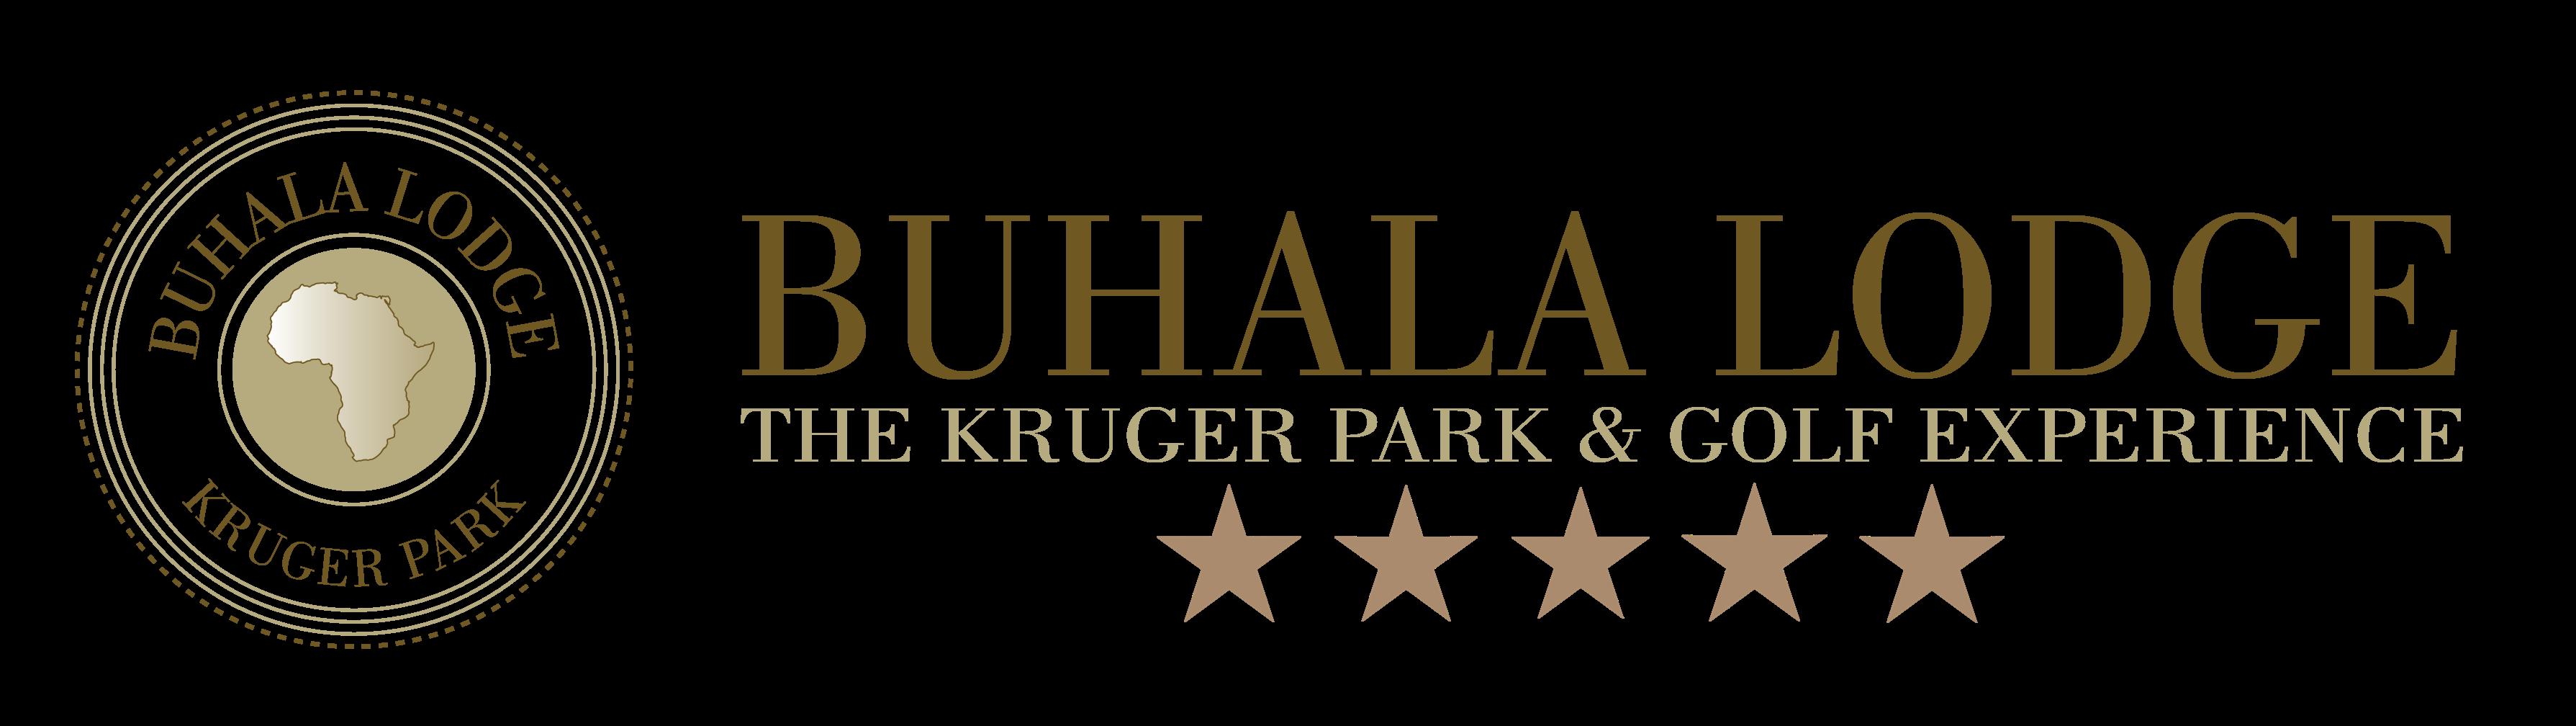 Buhala Lodge